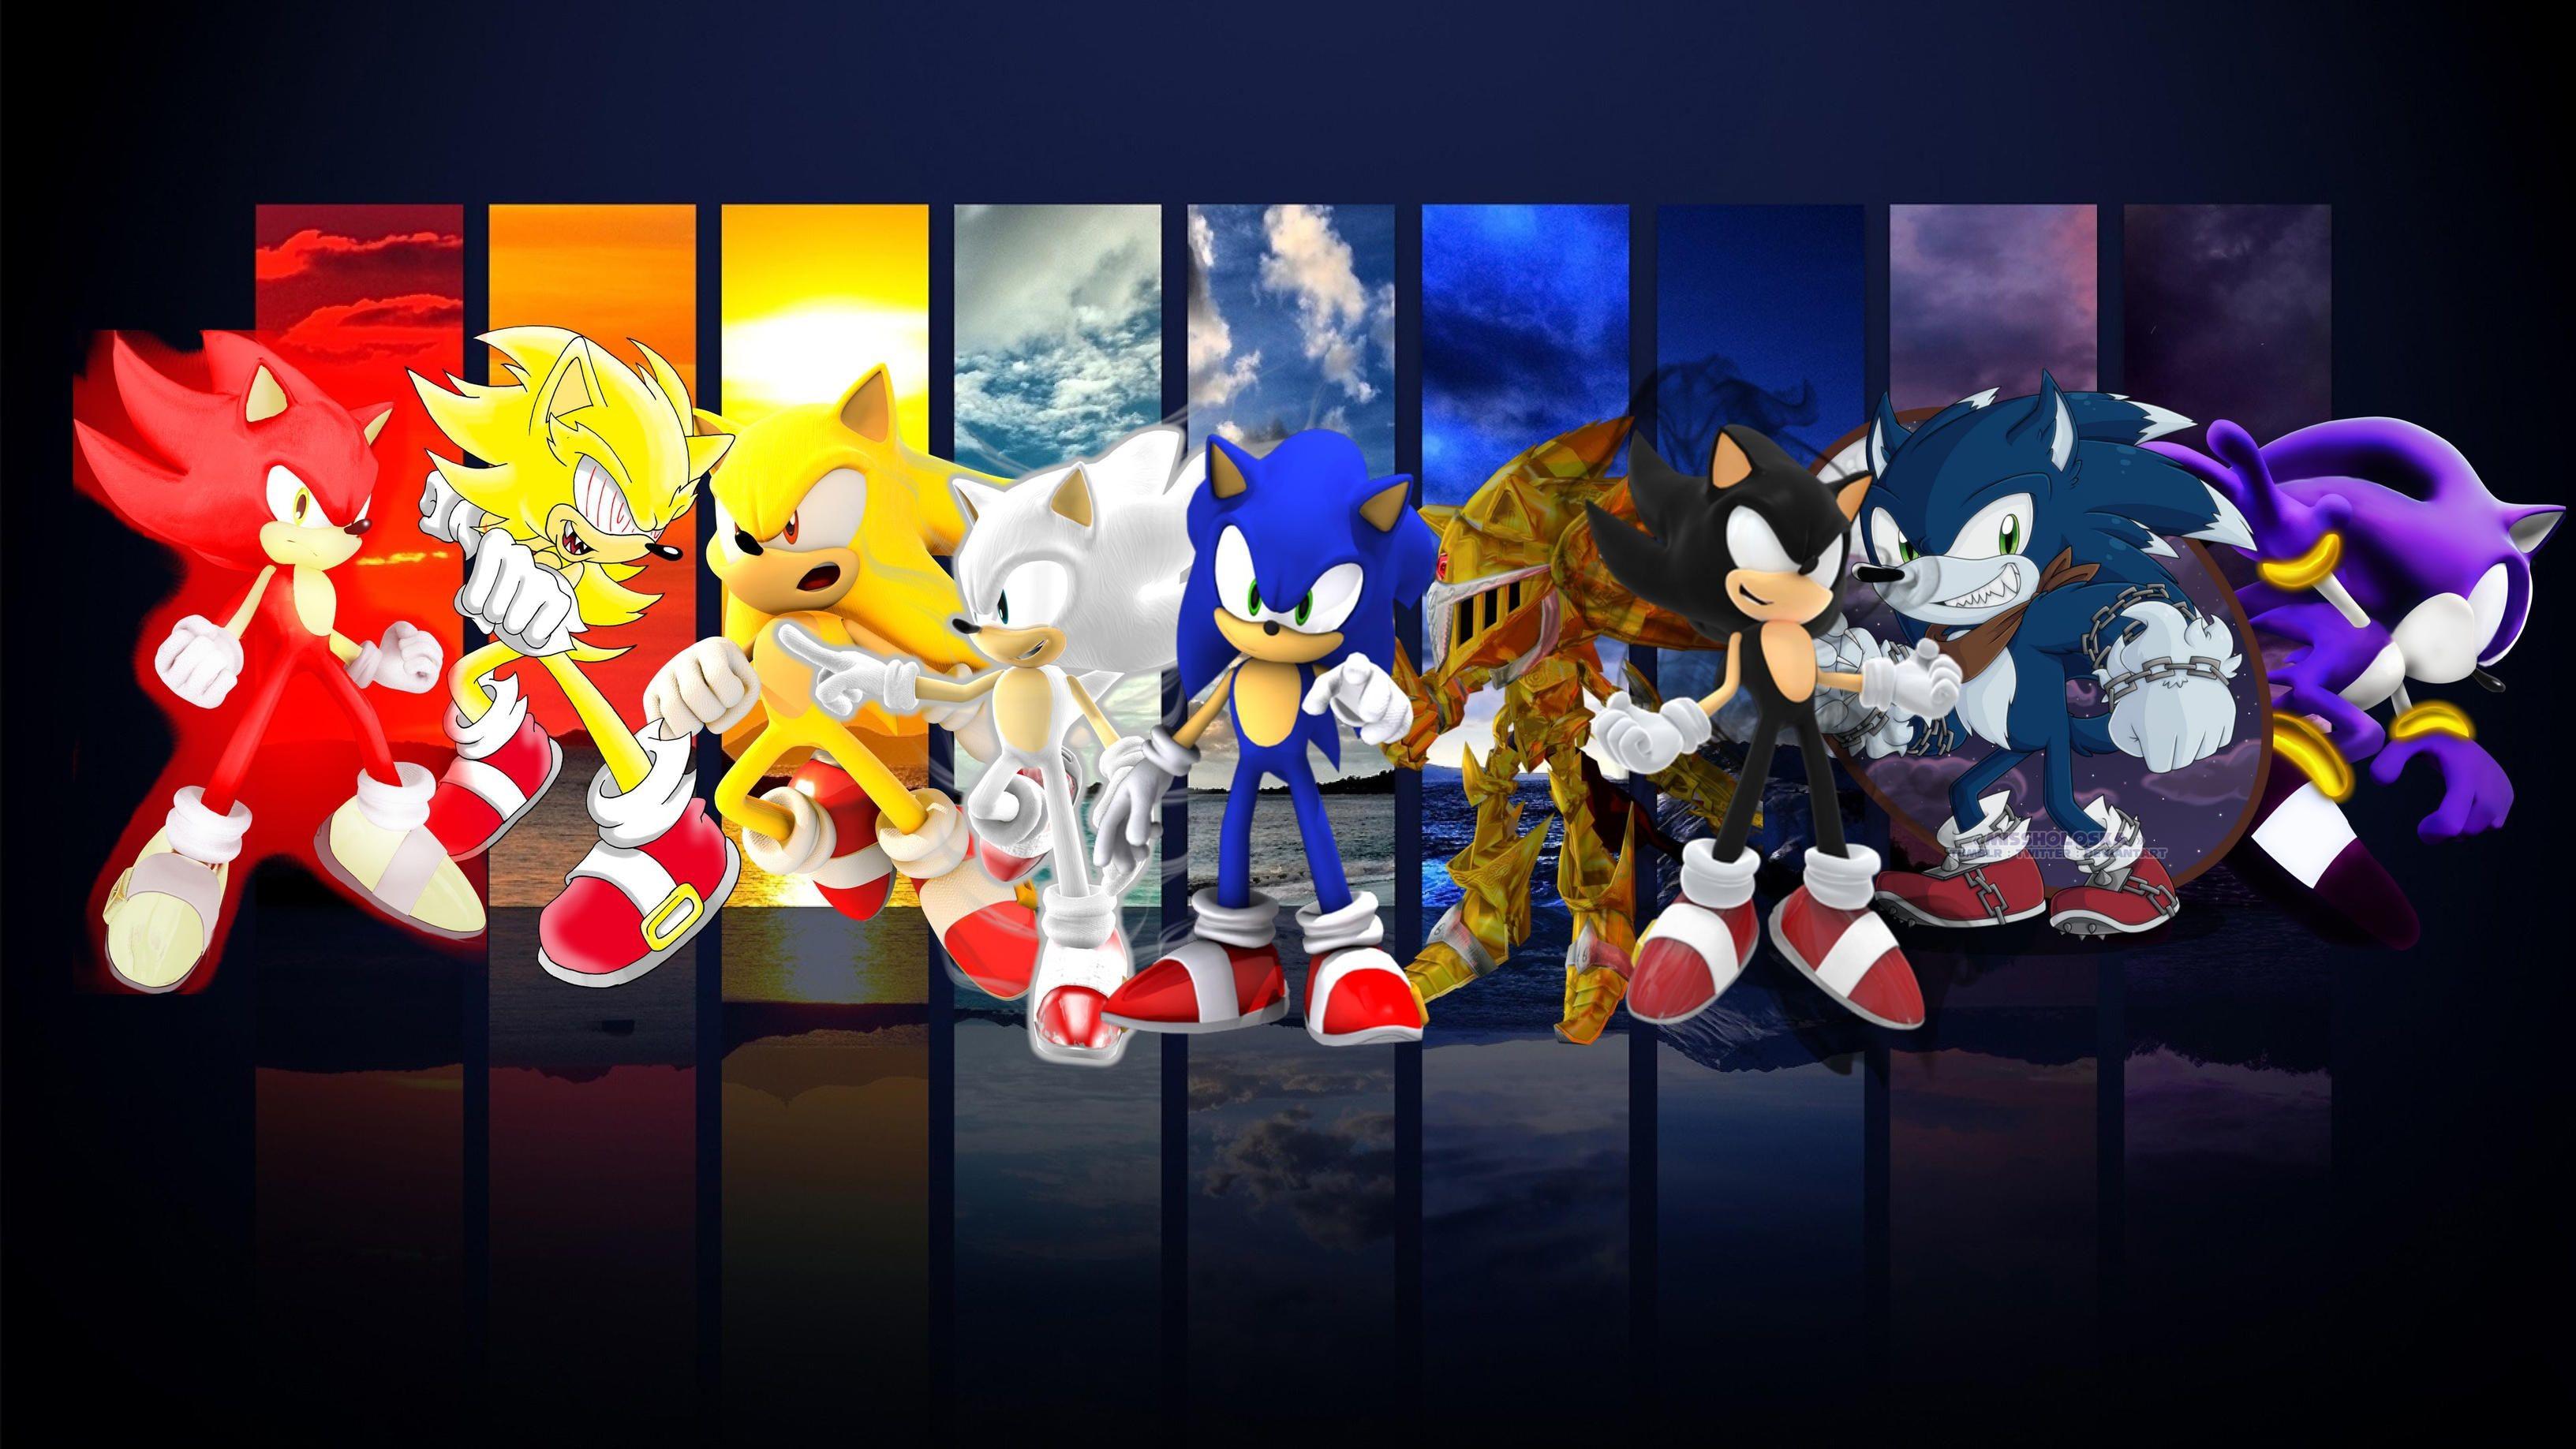 Hyper Sonic the Hedgehog Wallpaper ·① WallpaperTag